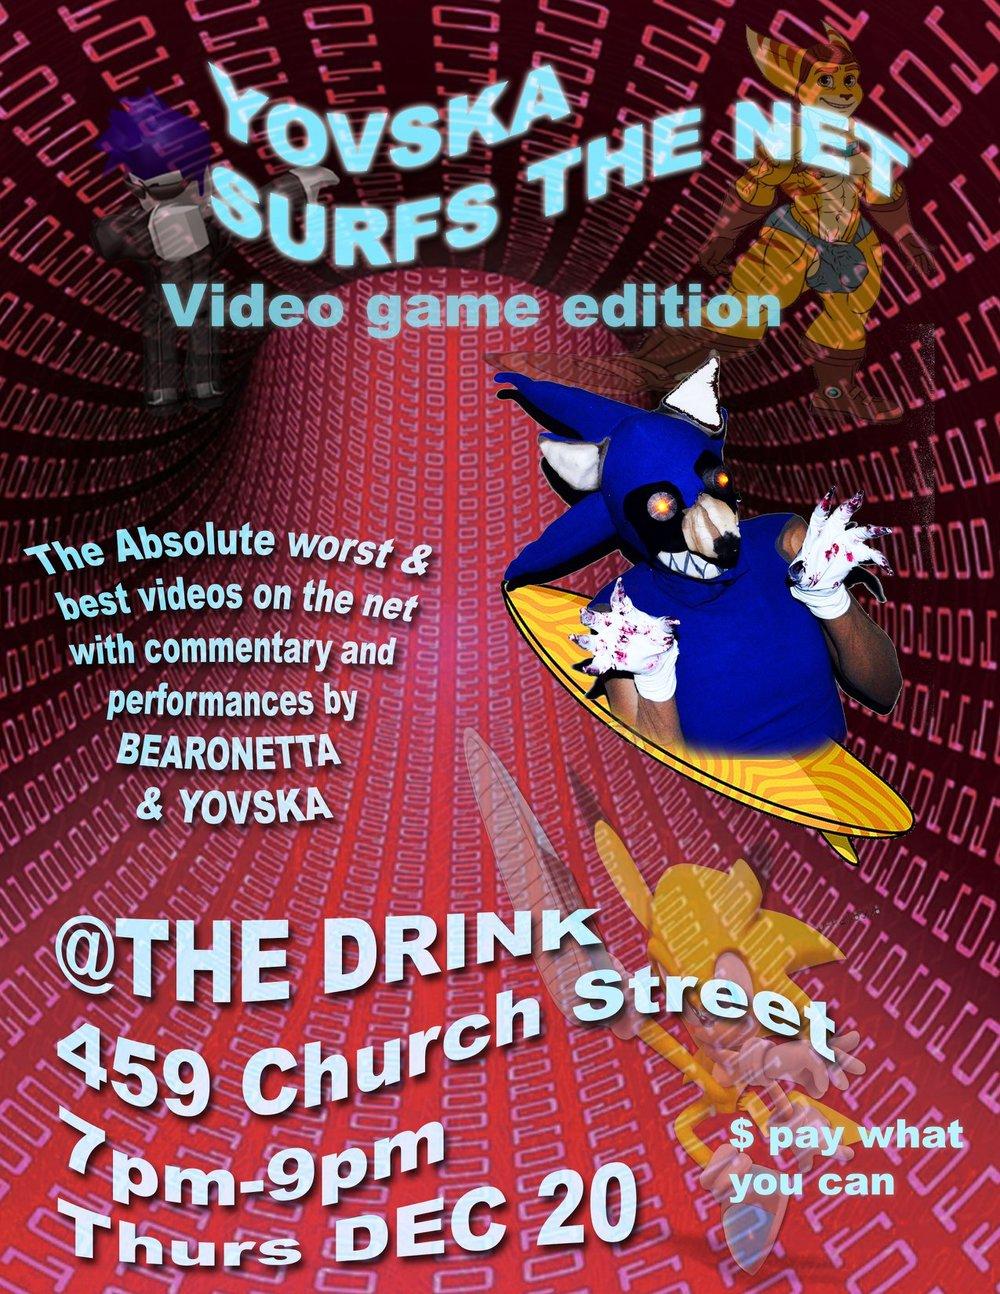 Yovska-Surfs-The-Net#2-(VideoGames)